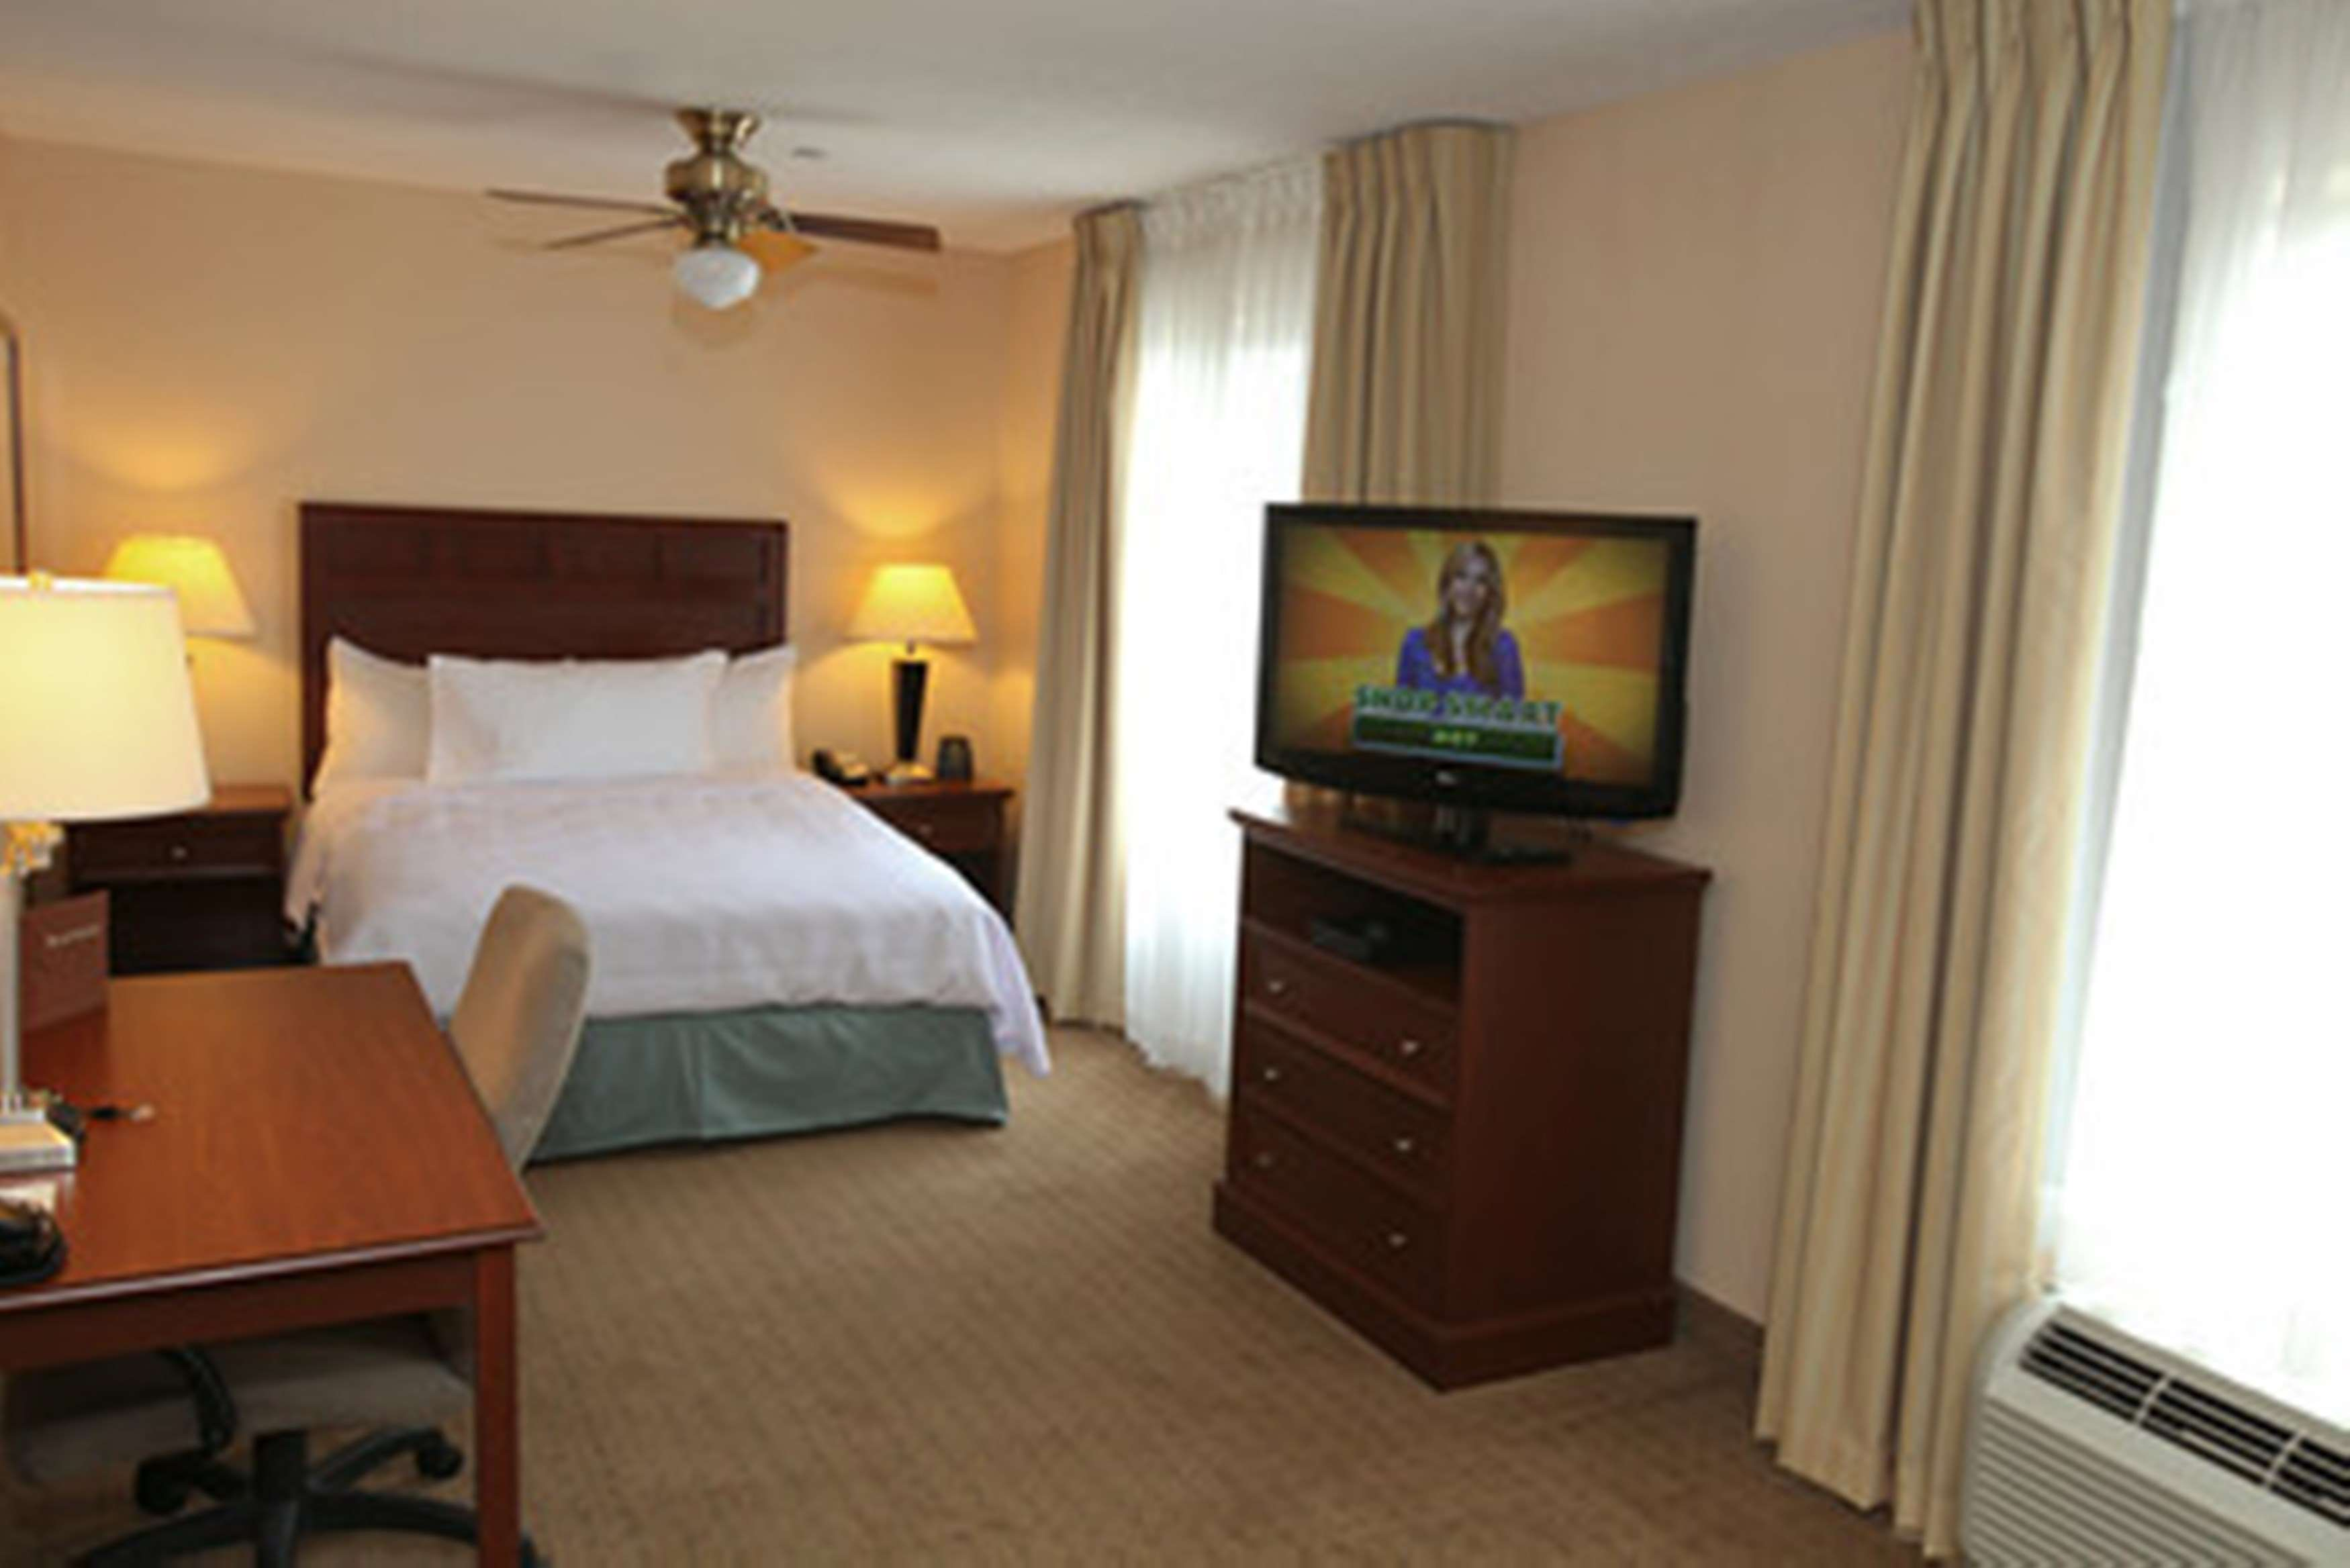 Homewood Suites by Hilton Orland Park image 19